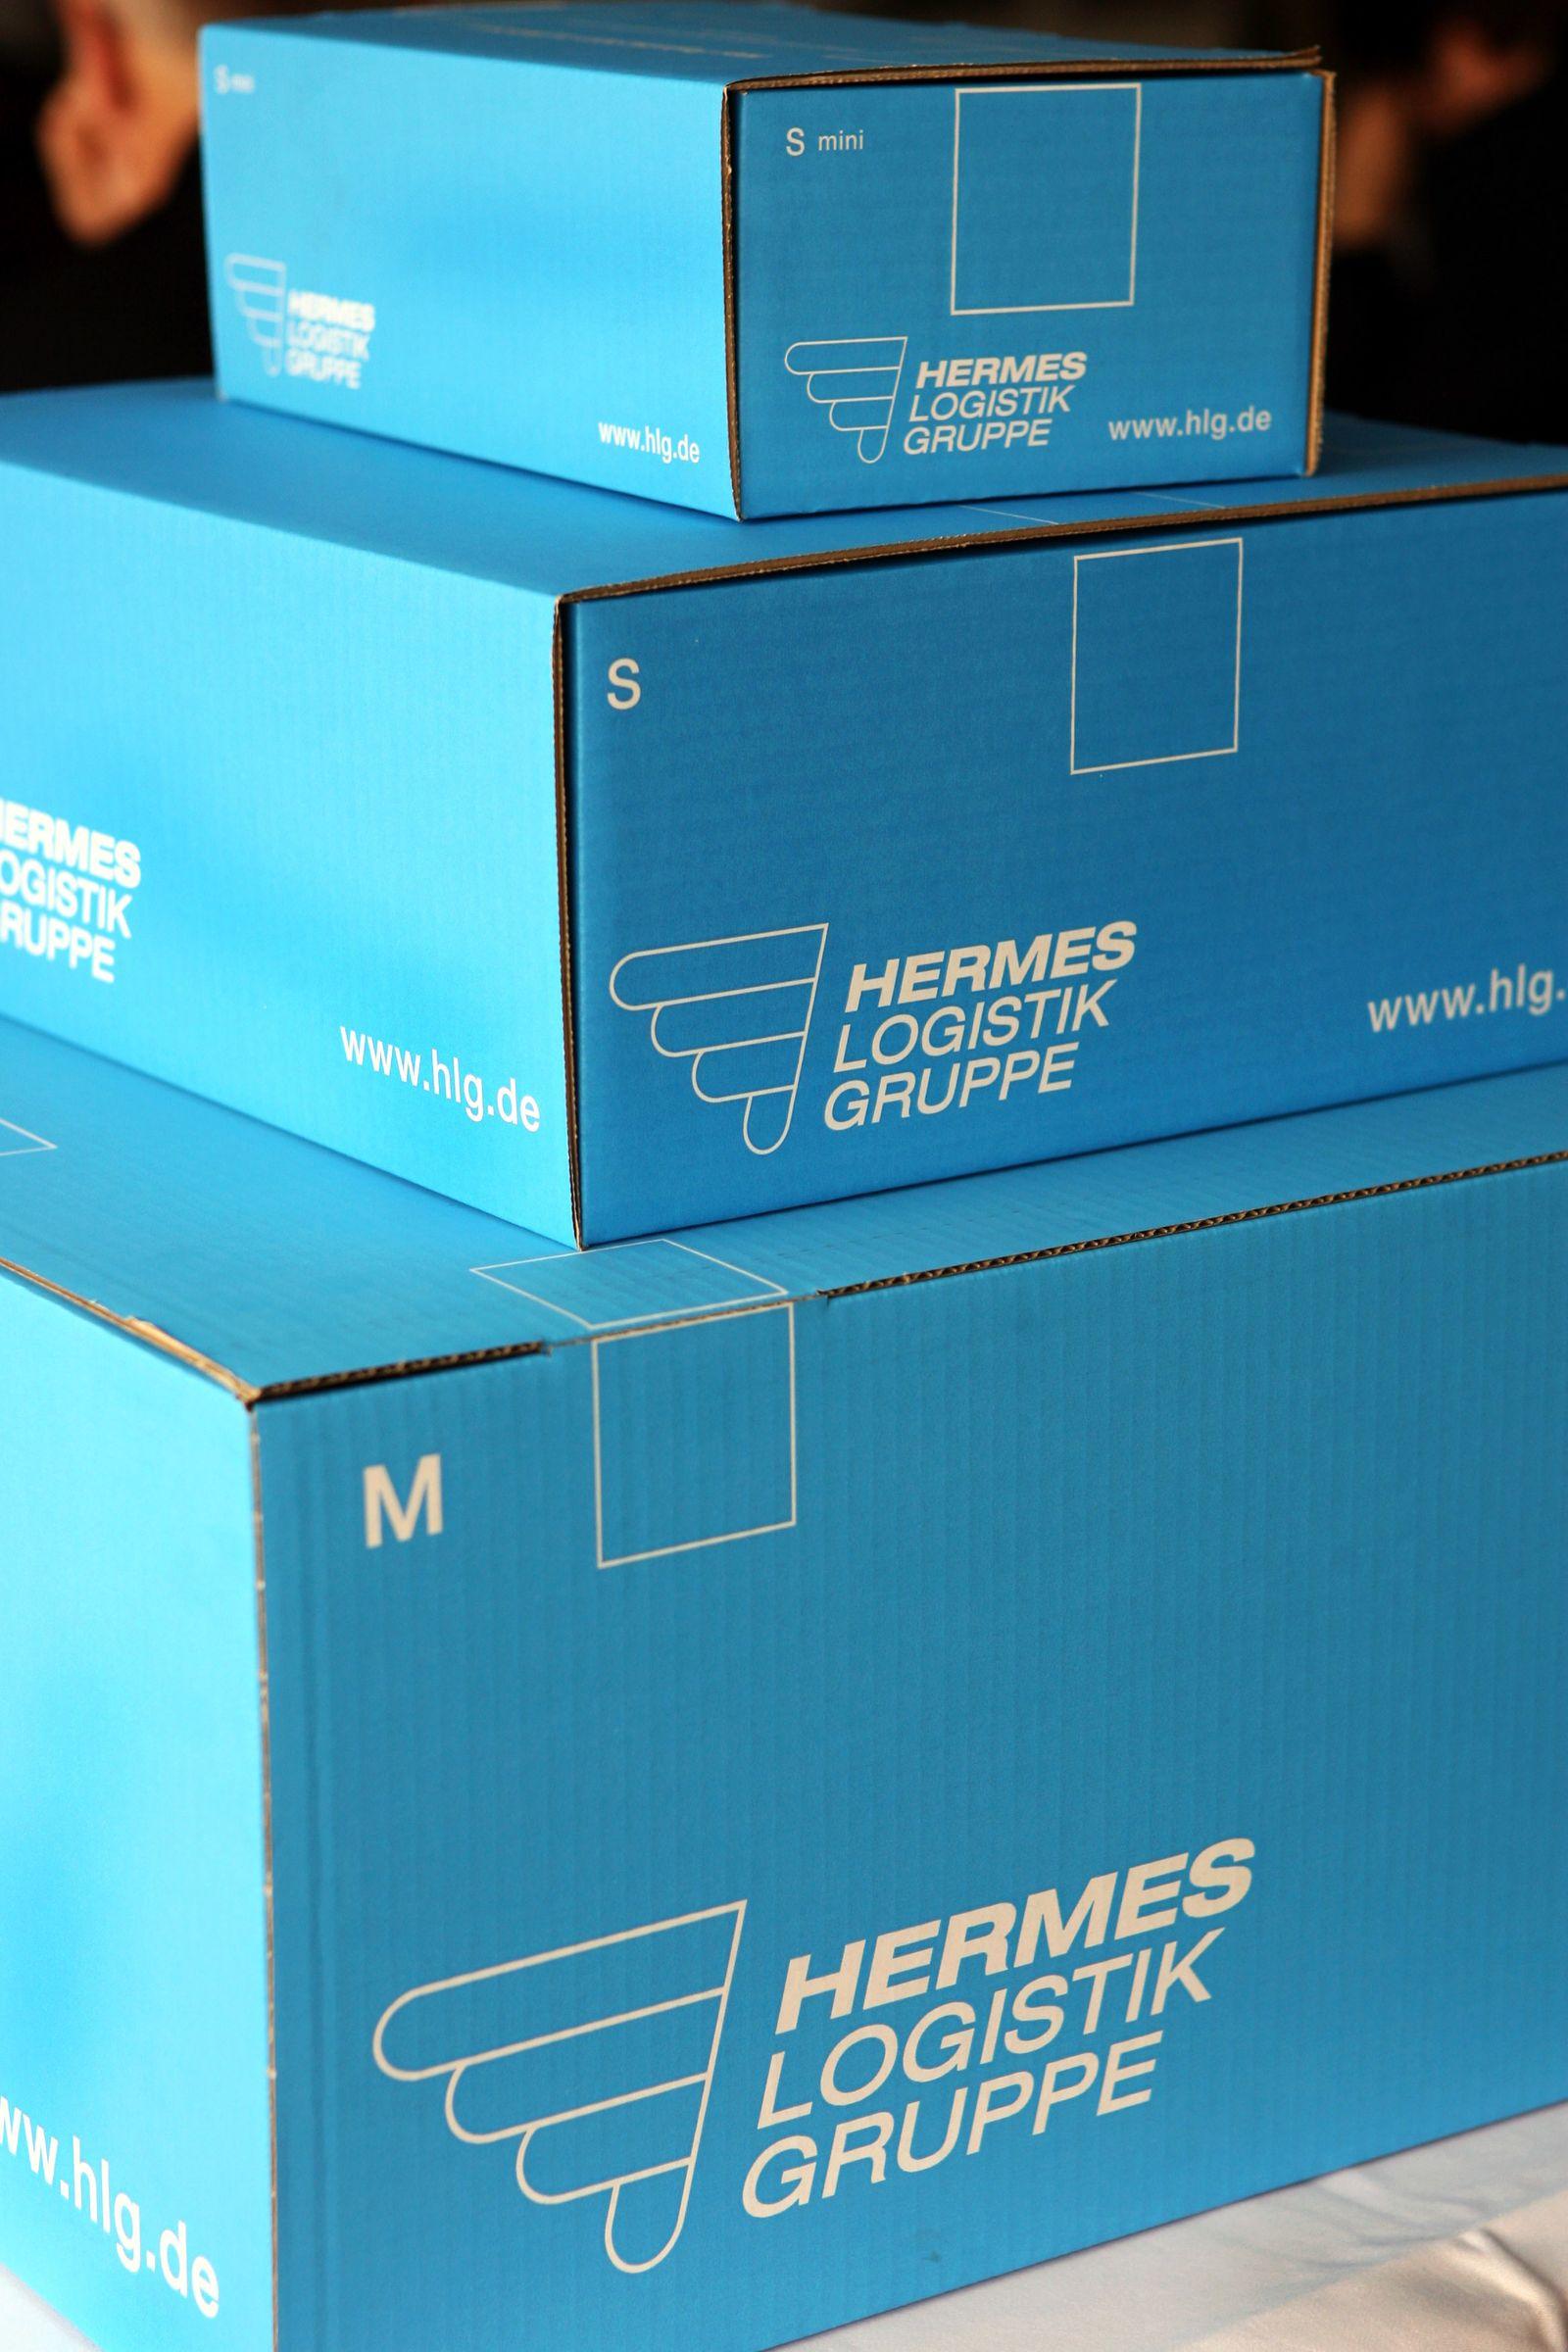 Hermes Logistik / Pakete